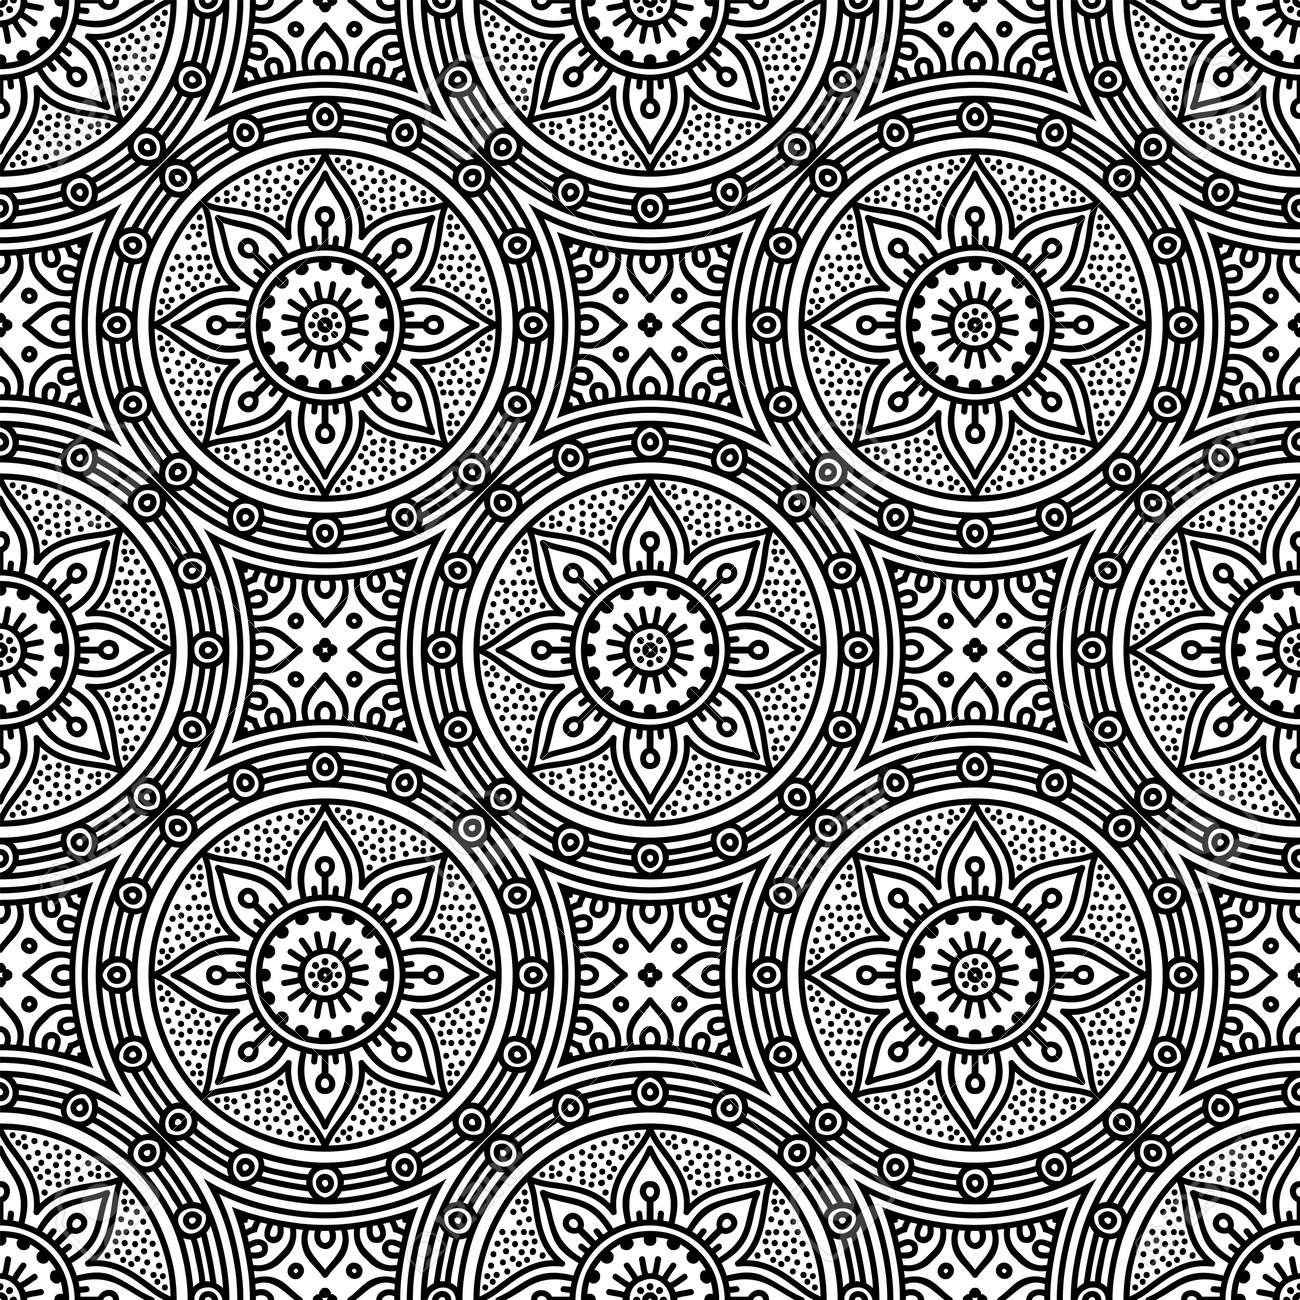 Seamless pattern. Vintage decorative elements - 152477250